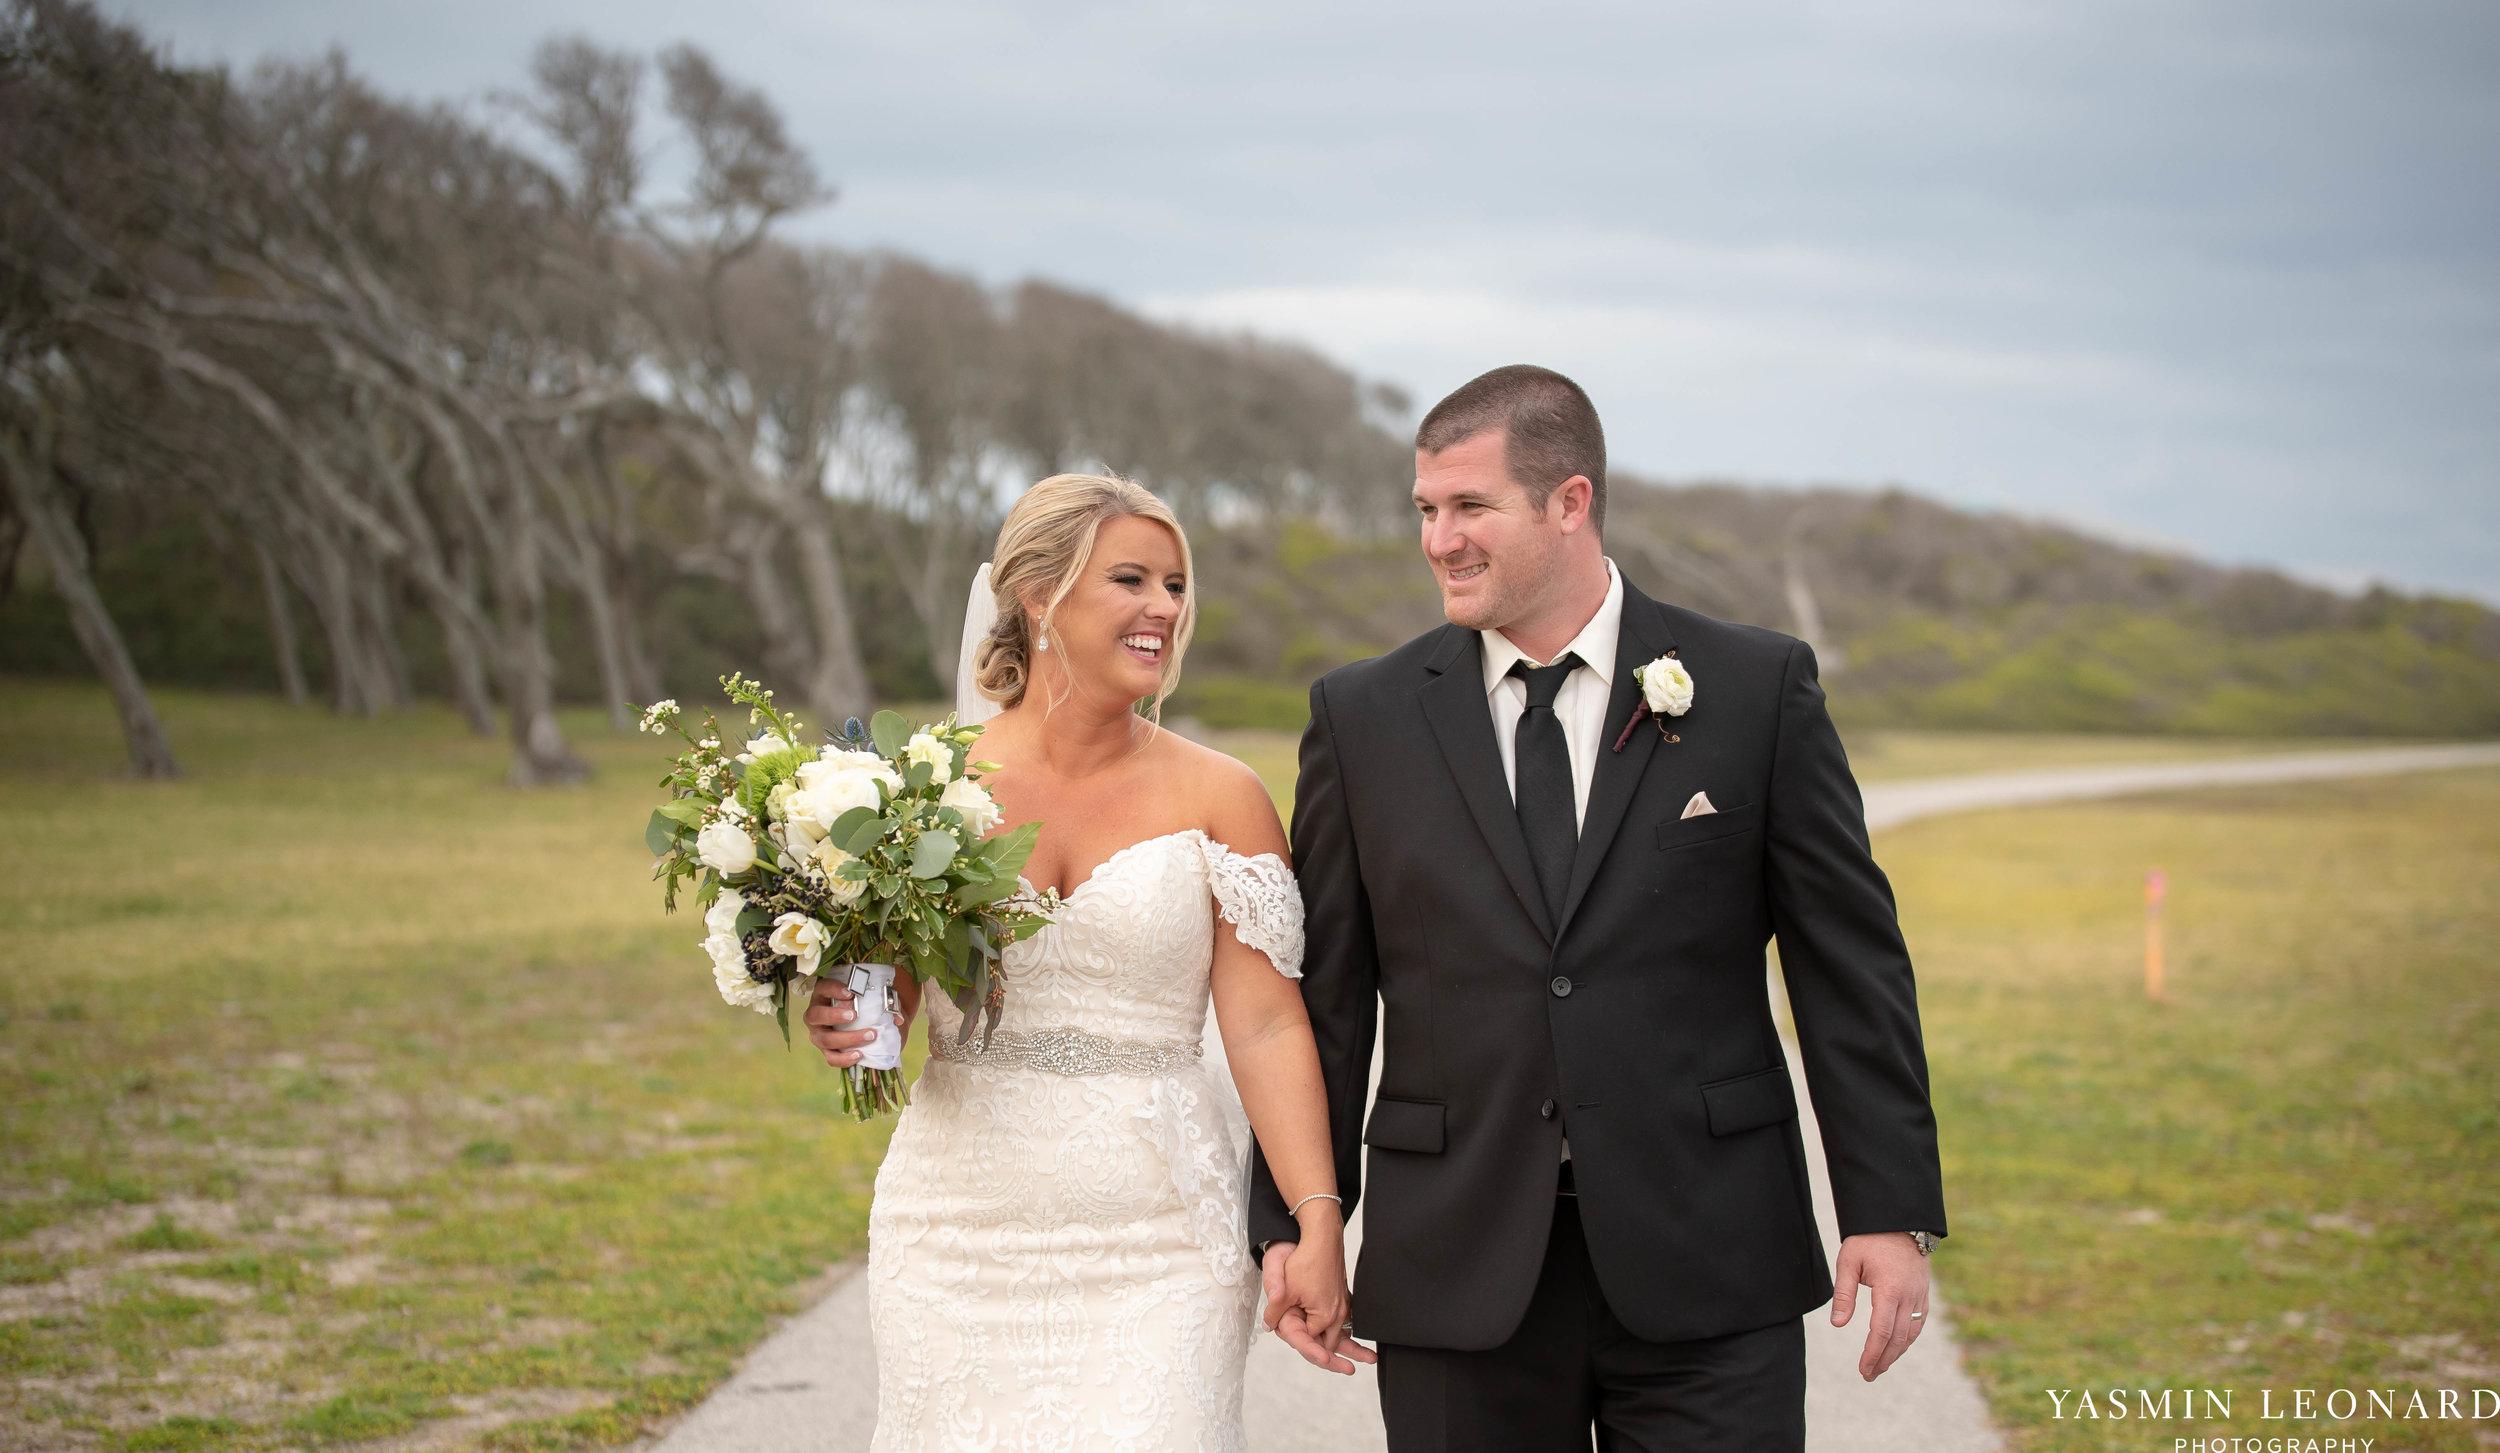 Carolina Beach Wedding - Fort Fisher Wedding - NC Acquarium - Beach Wedding - NC Wedding - Beach Wedding Inspiration - Beach Bride-31.jpg